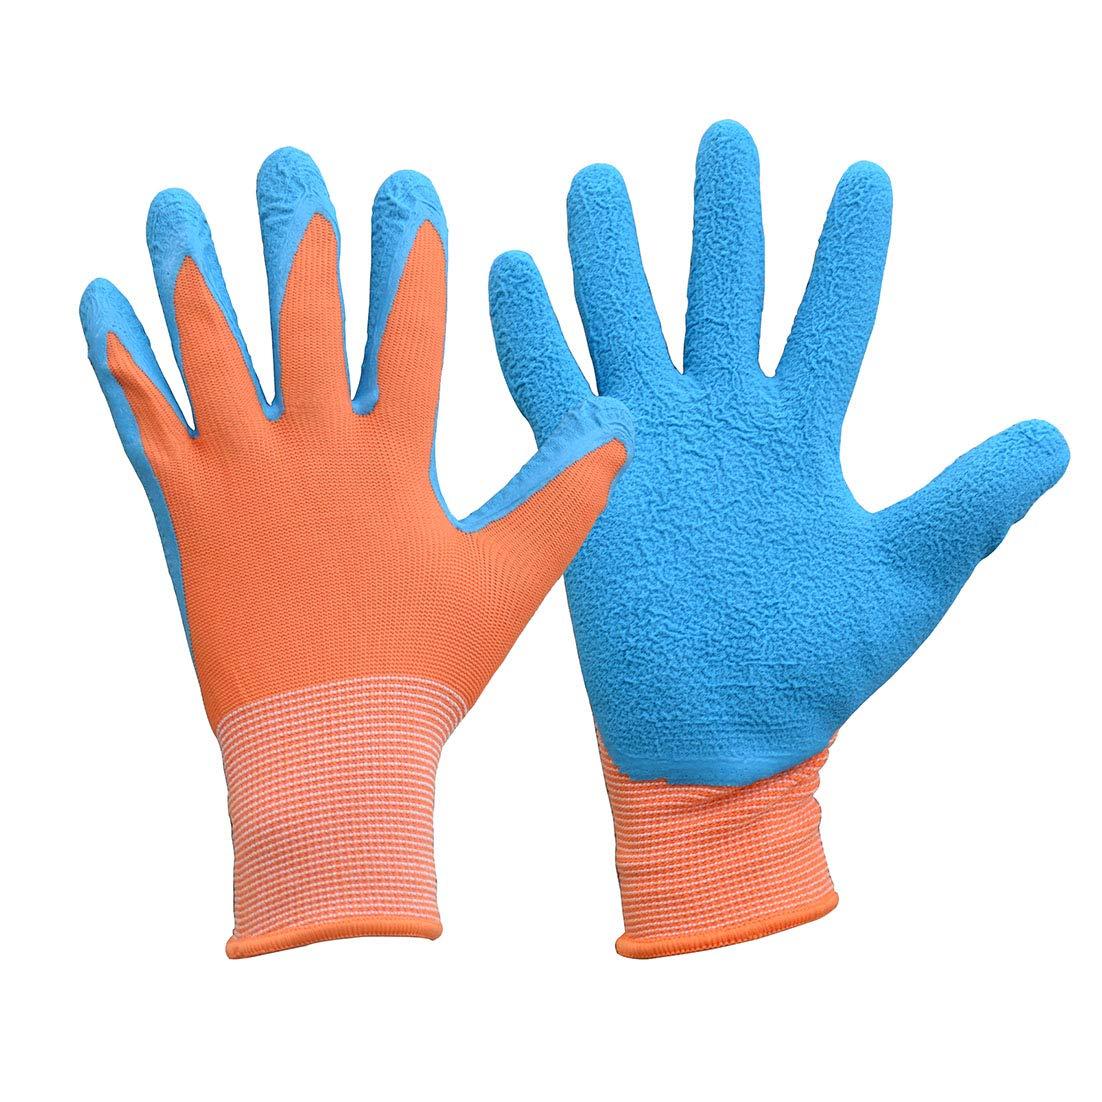 Guantes de trabajo de protecció n de lá tex para jardinerí a de niñ os, Size 2, naranja/azul, 1 Euglove